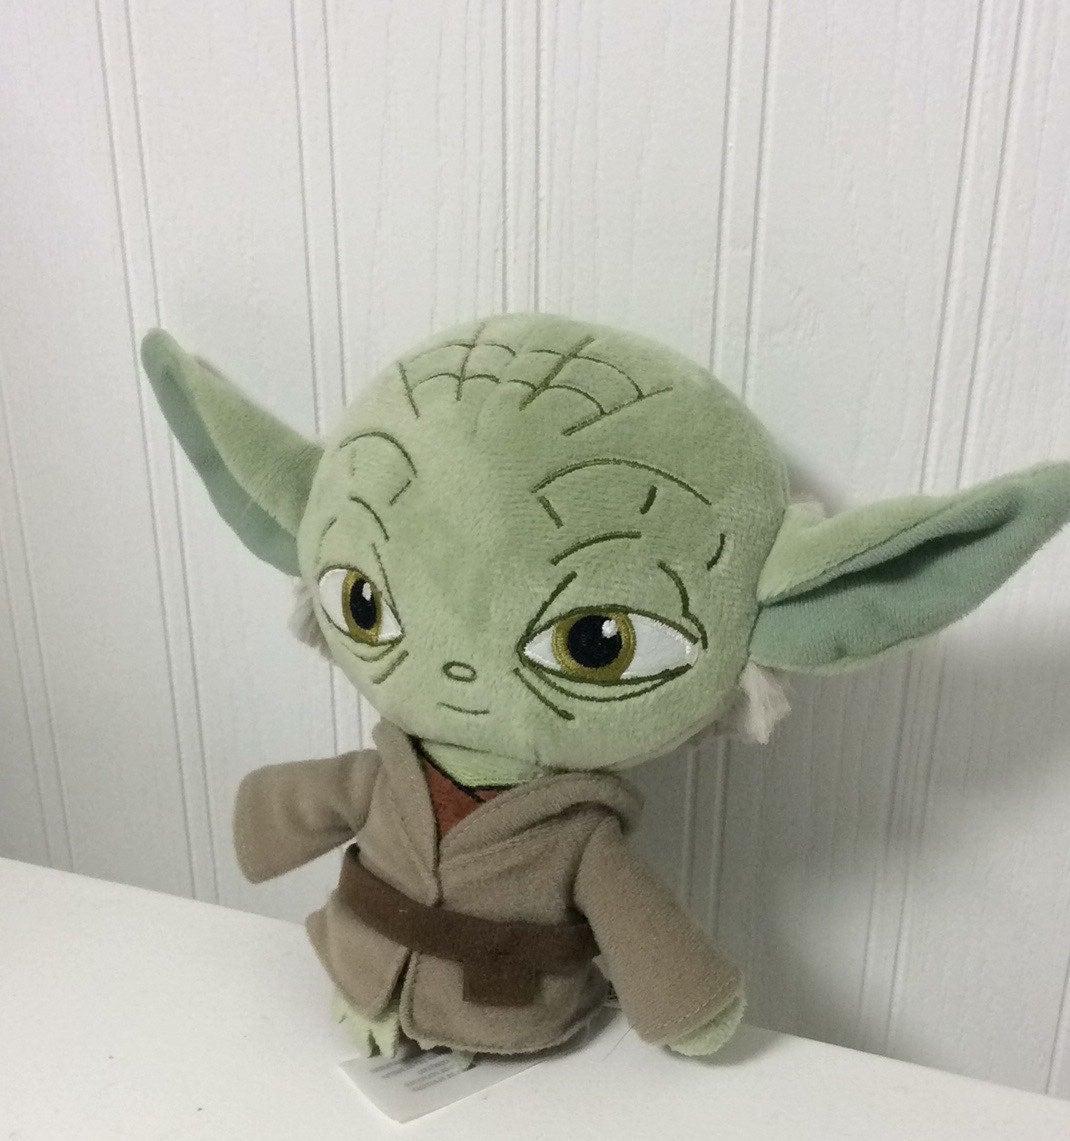 Baby Yoda Character Plush